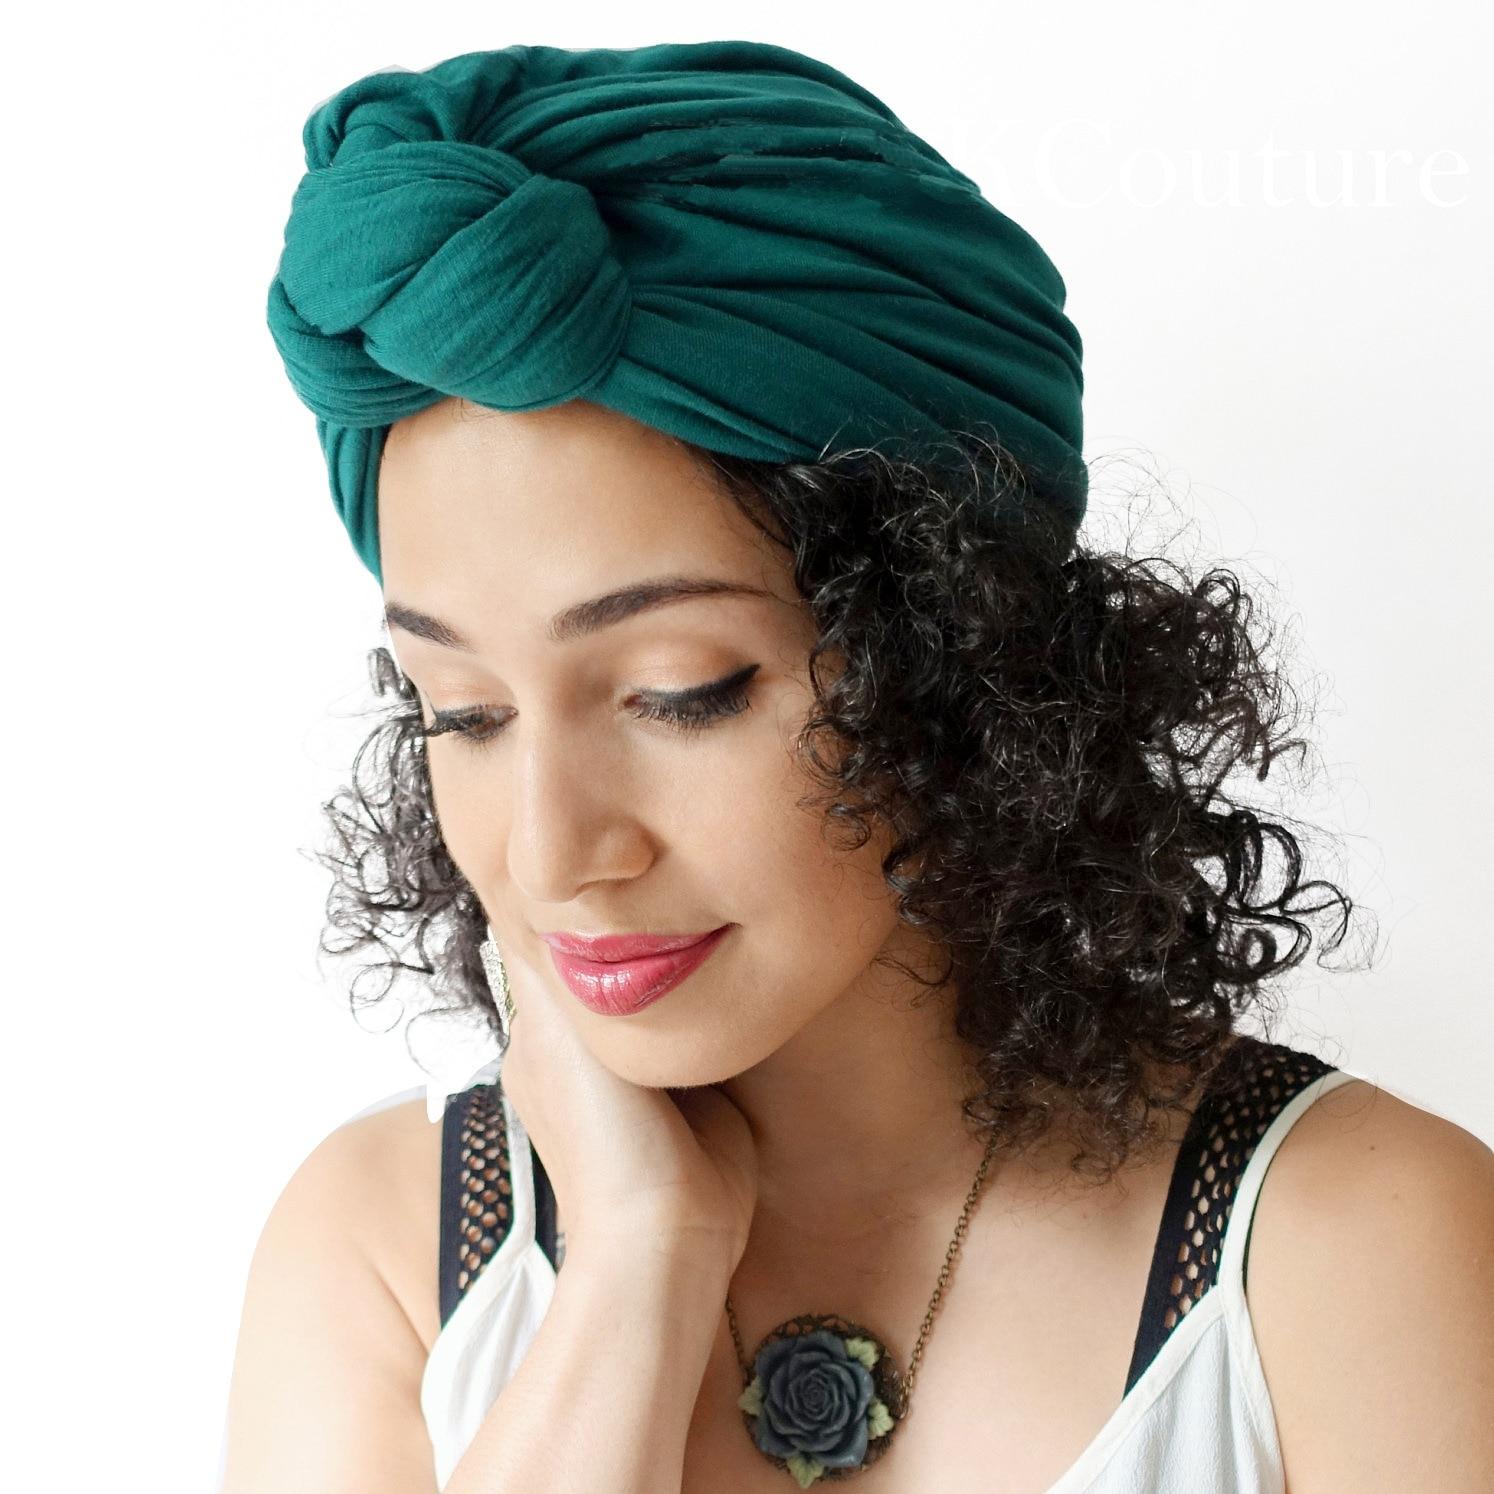 Bohemia Style Fashion Braid Knot Women Turban Hats Elastic Cloth Women Hijabs Cotton Cover Inner Hijab Cap Wear Hat